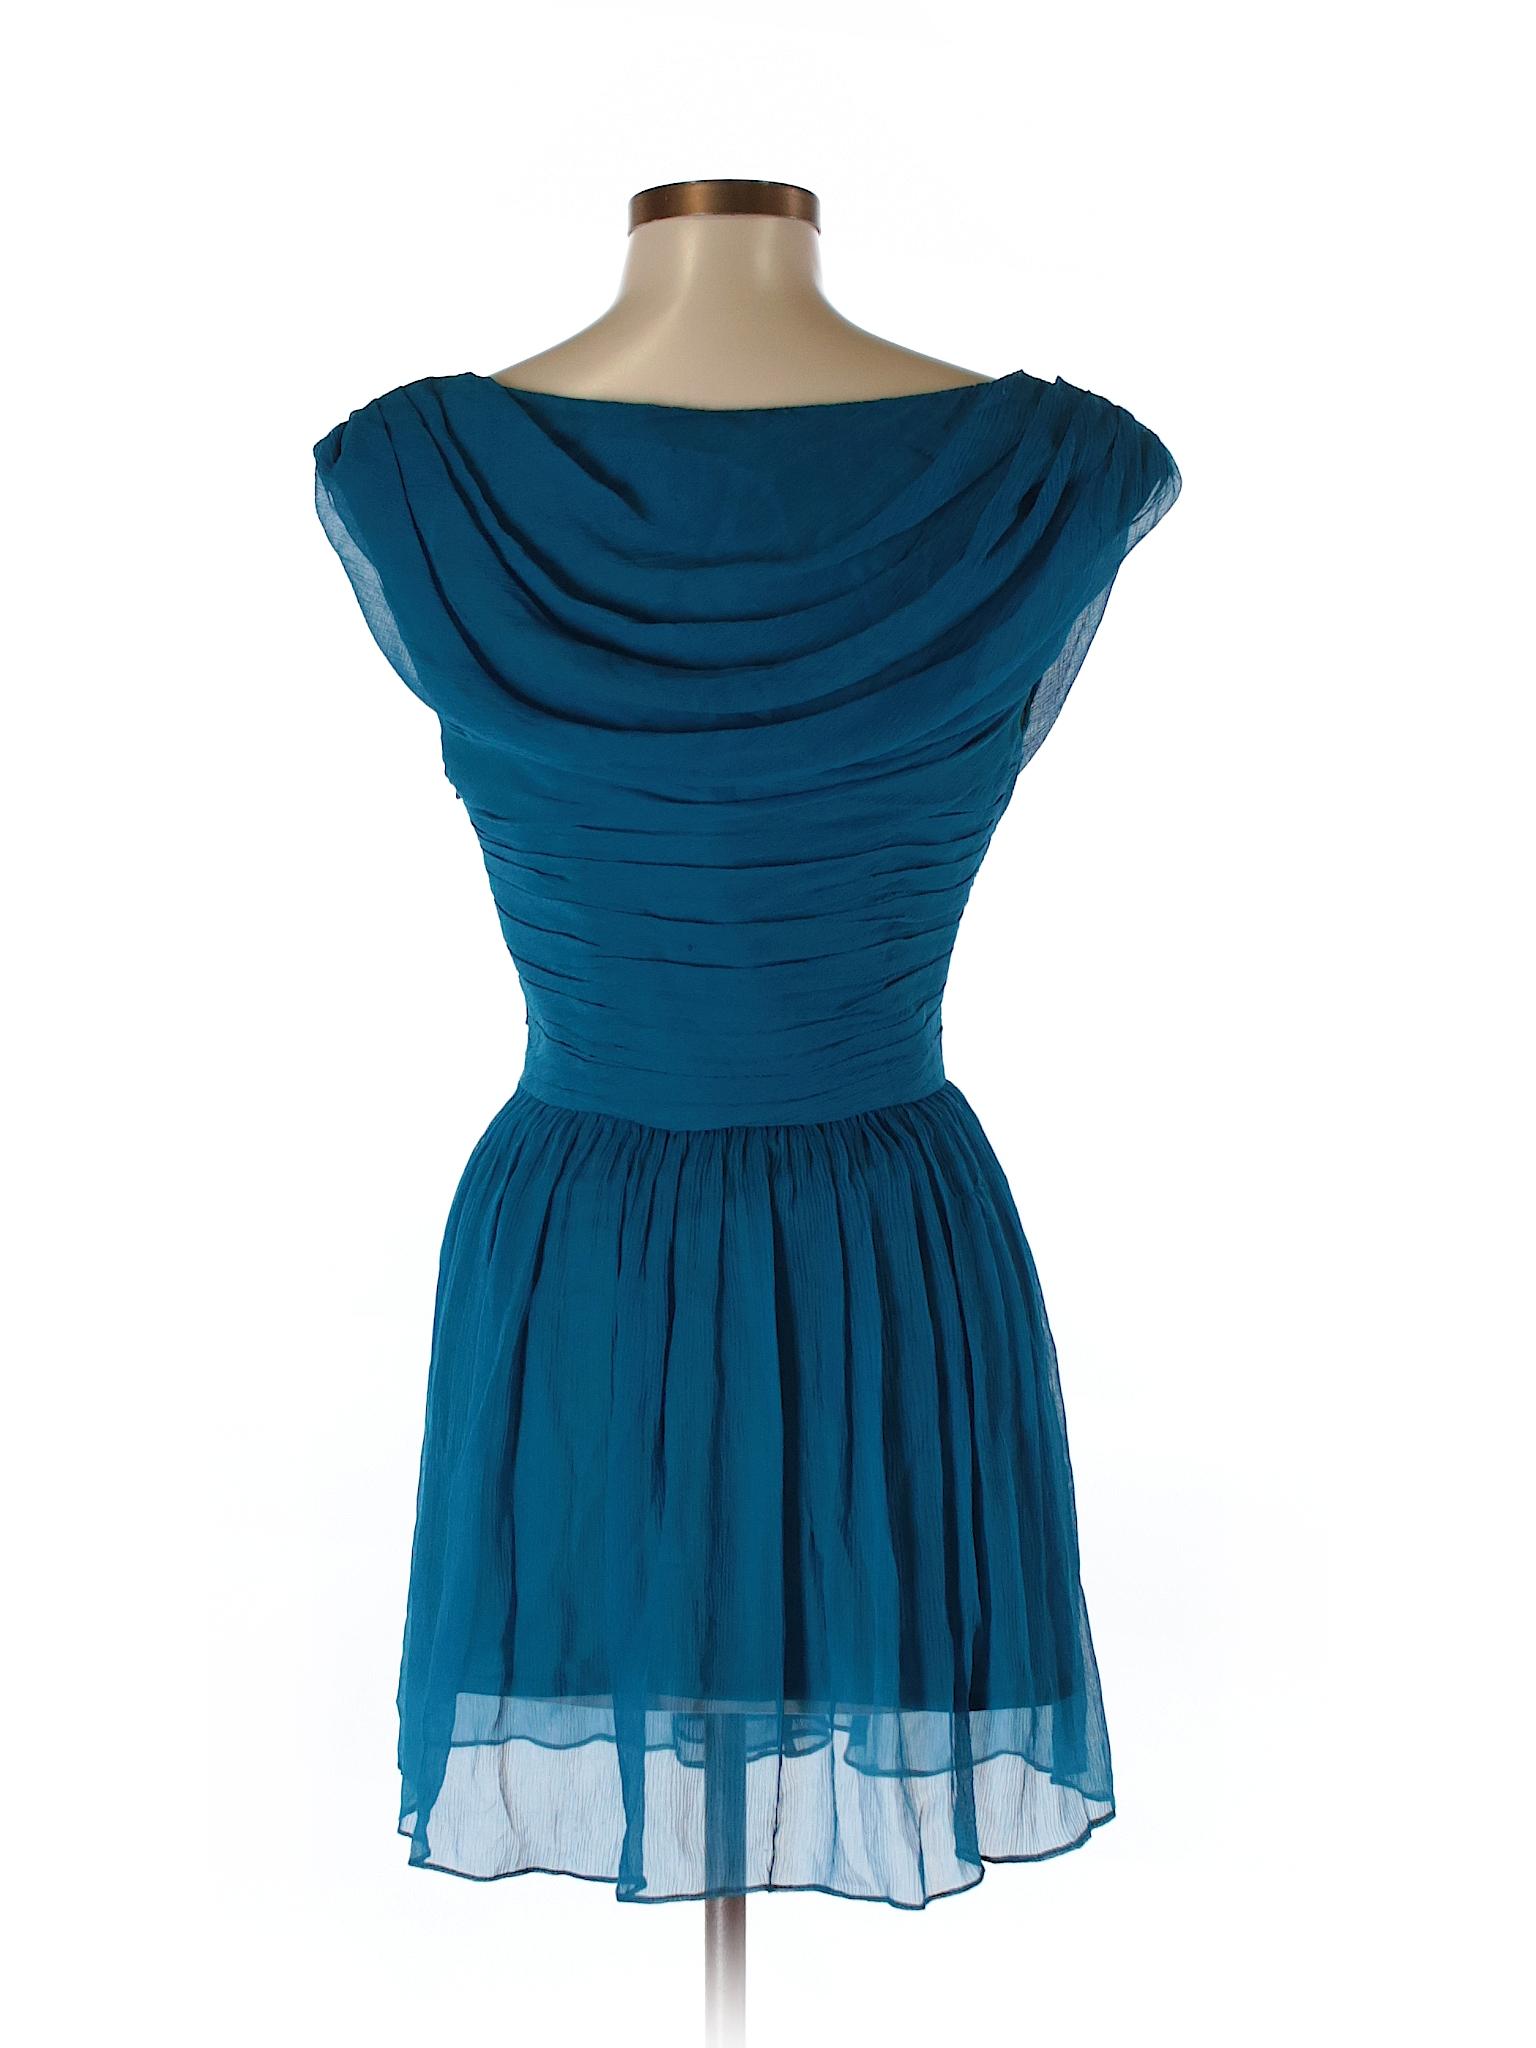 winter Silk Dress London Maggy Boutique 7OqFn